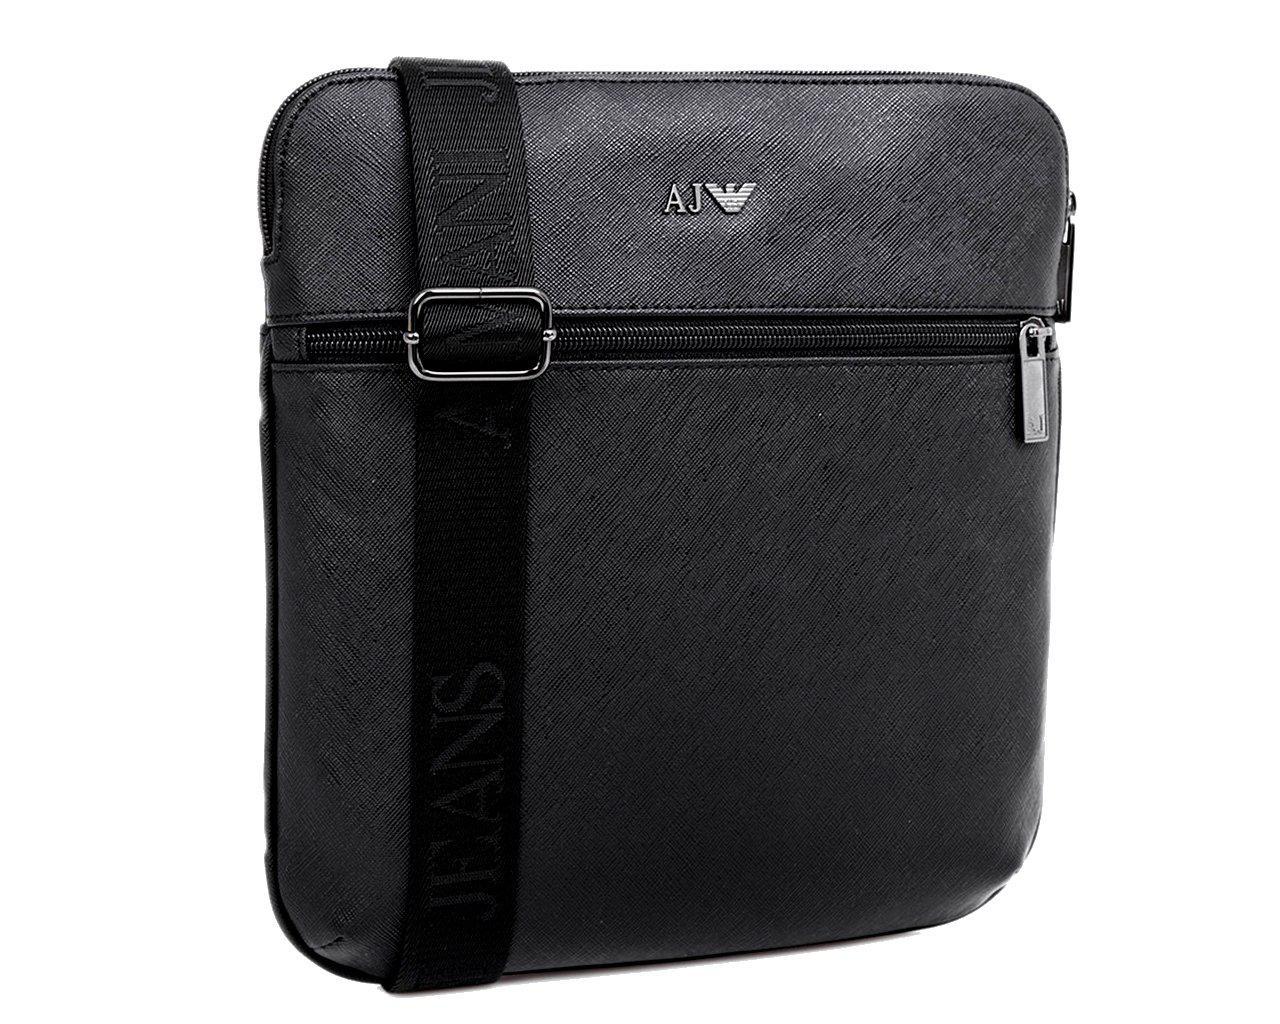 332ffd31967 Armani Jeans M Borsa Messenger Bag Black in Black for Men - Lyst